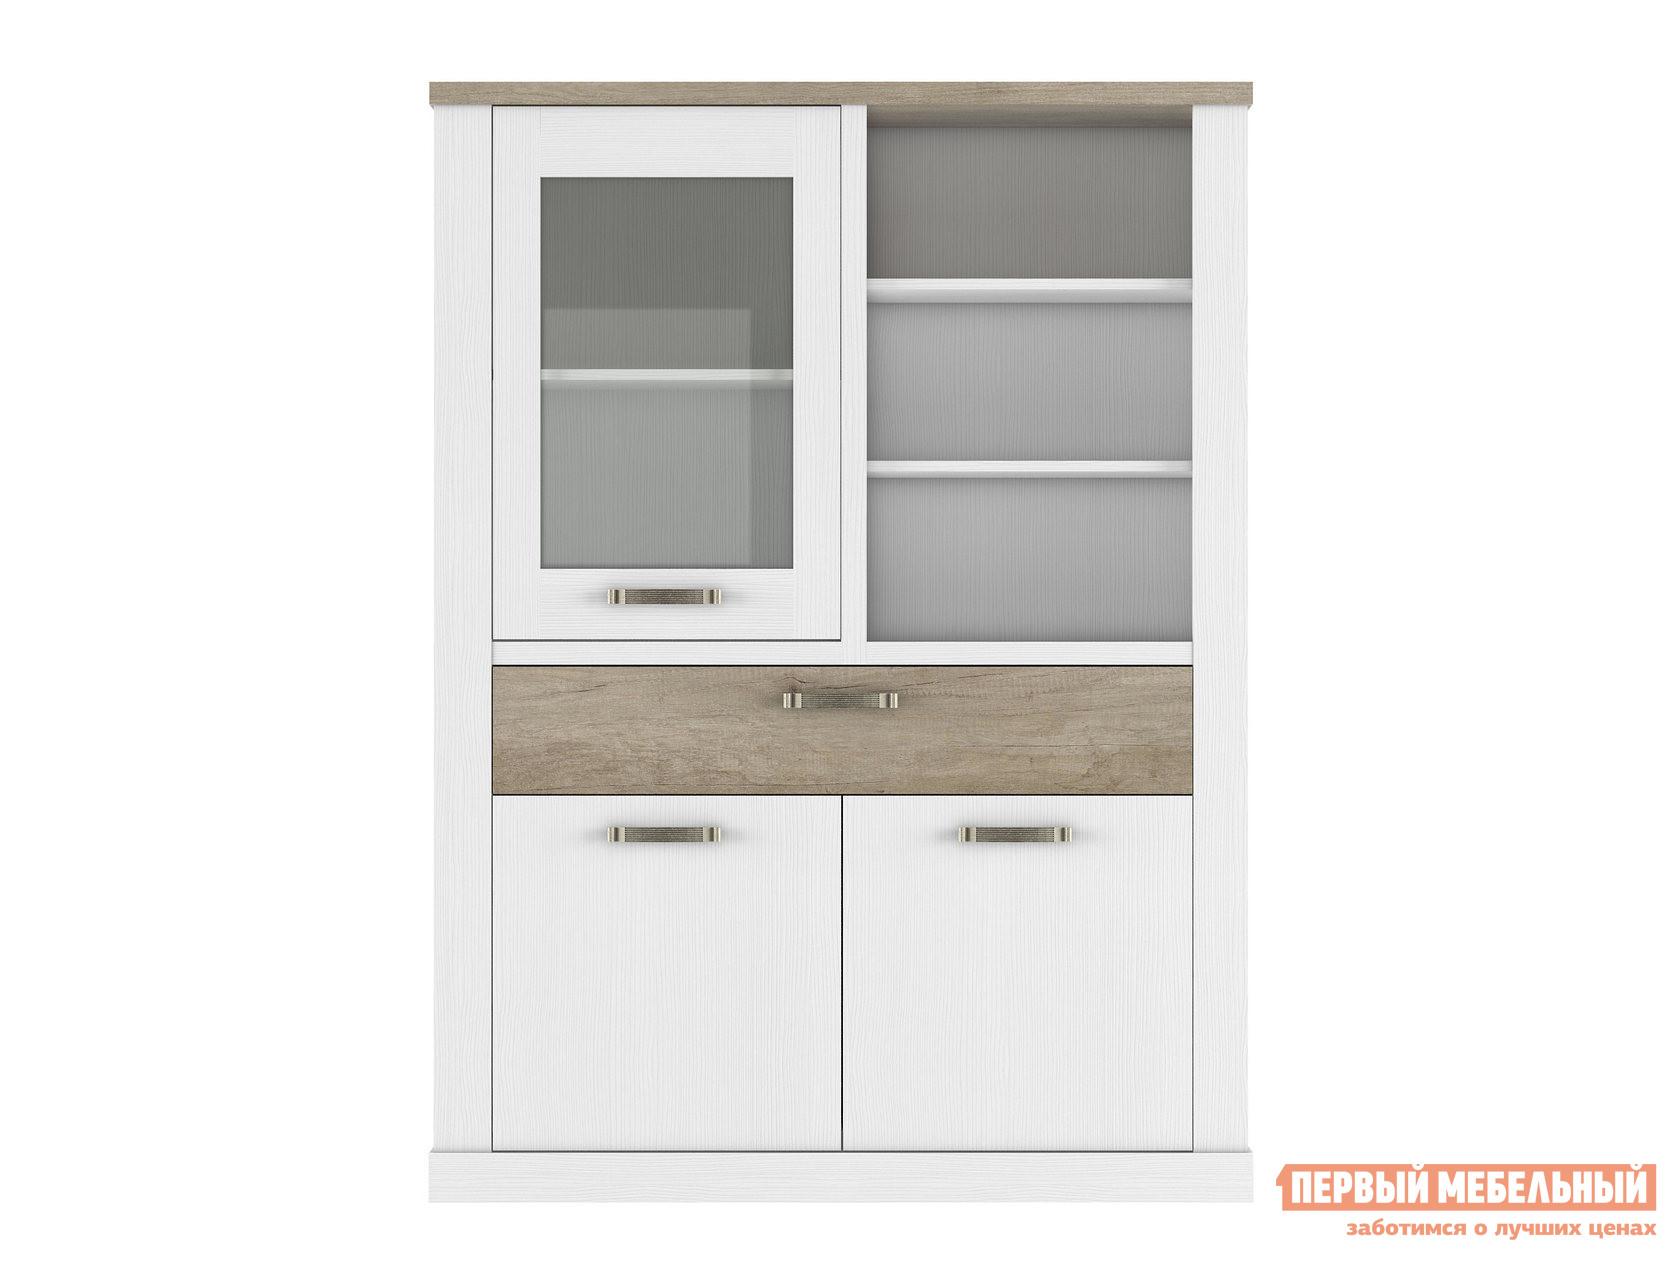 Шкаф-витрина Первый Мебельный Шкаф-витрина низкий 2 Прованс цены онлайн